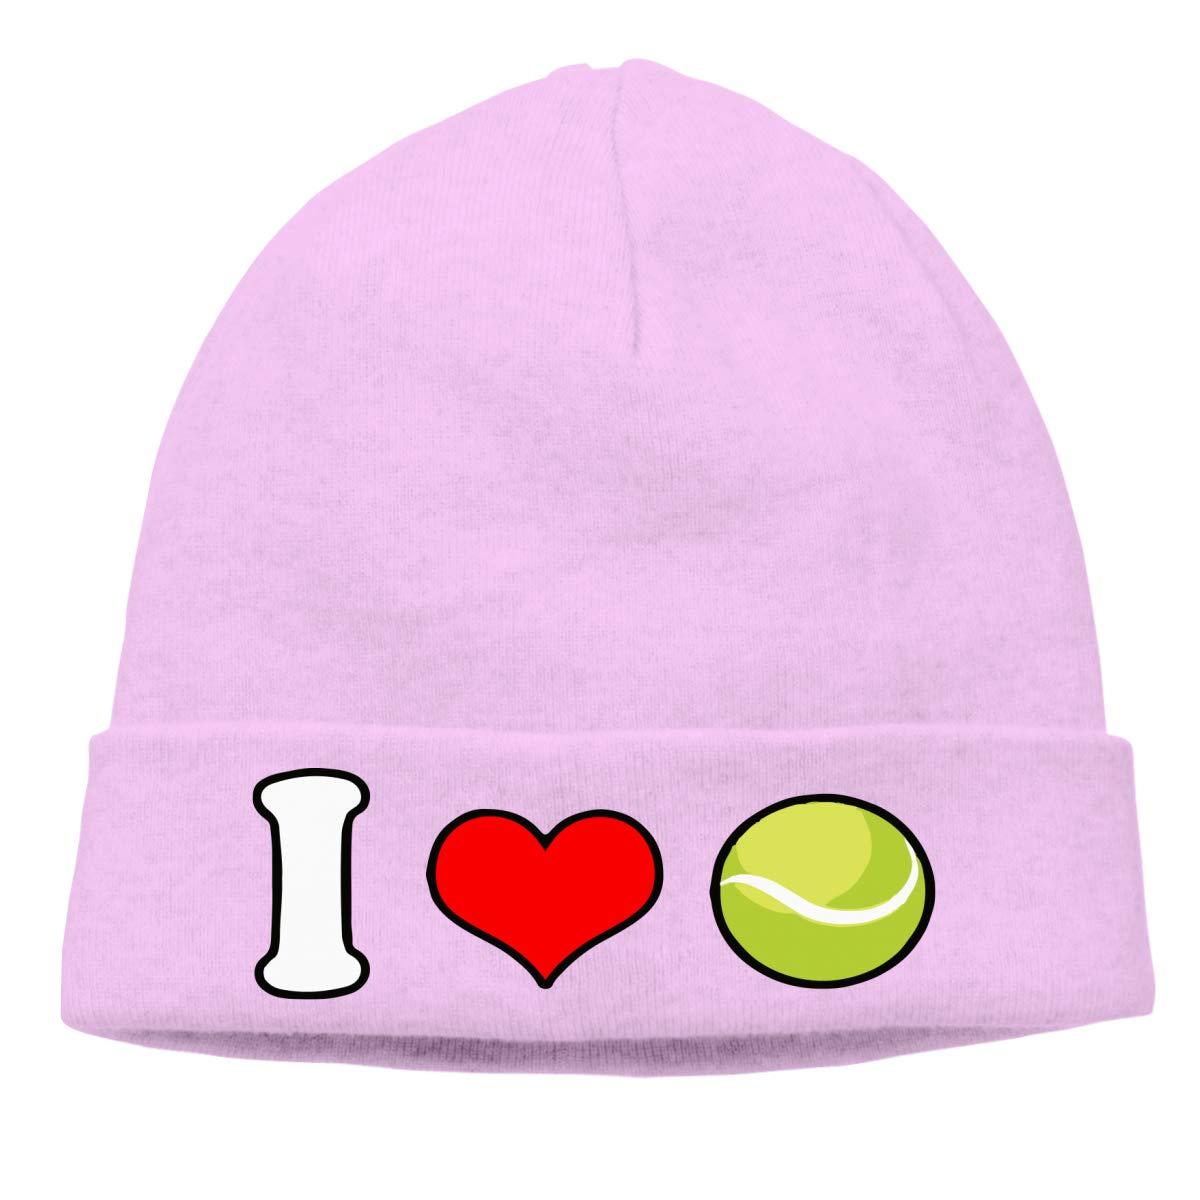 Unisex I Love Tennis Soft Knit Caps